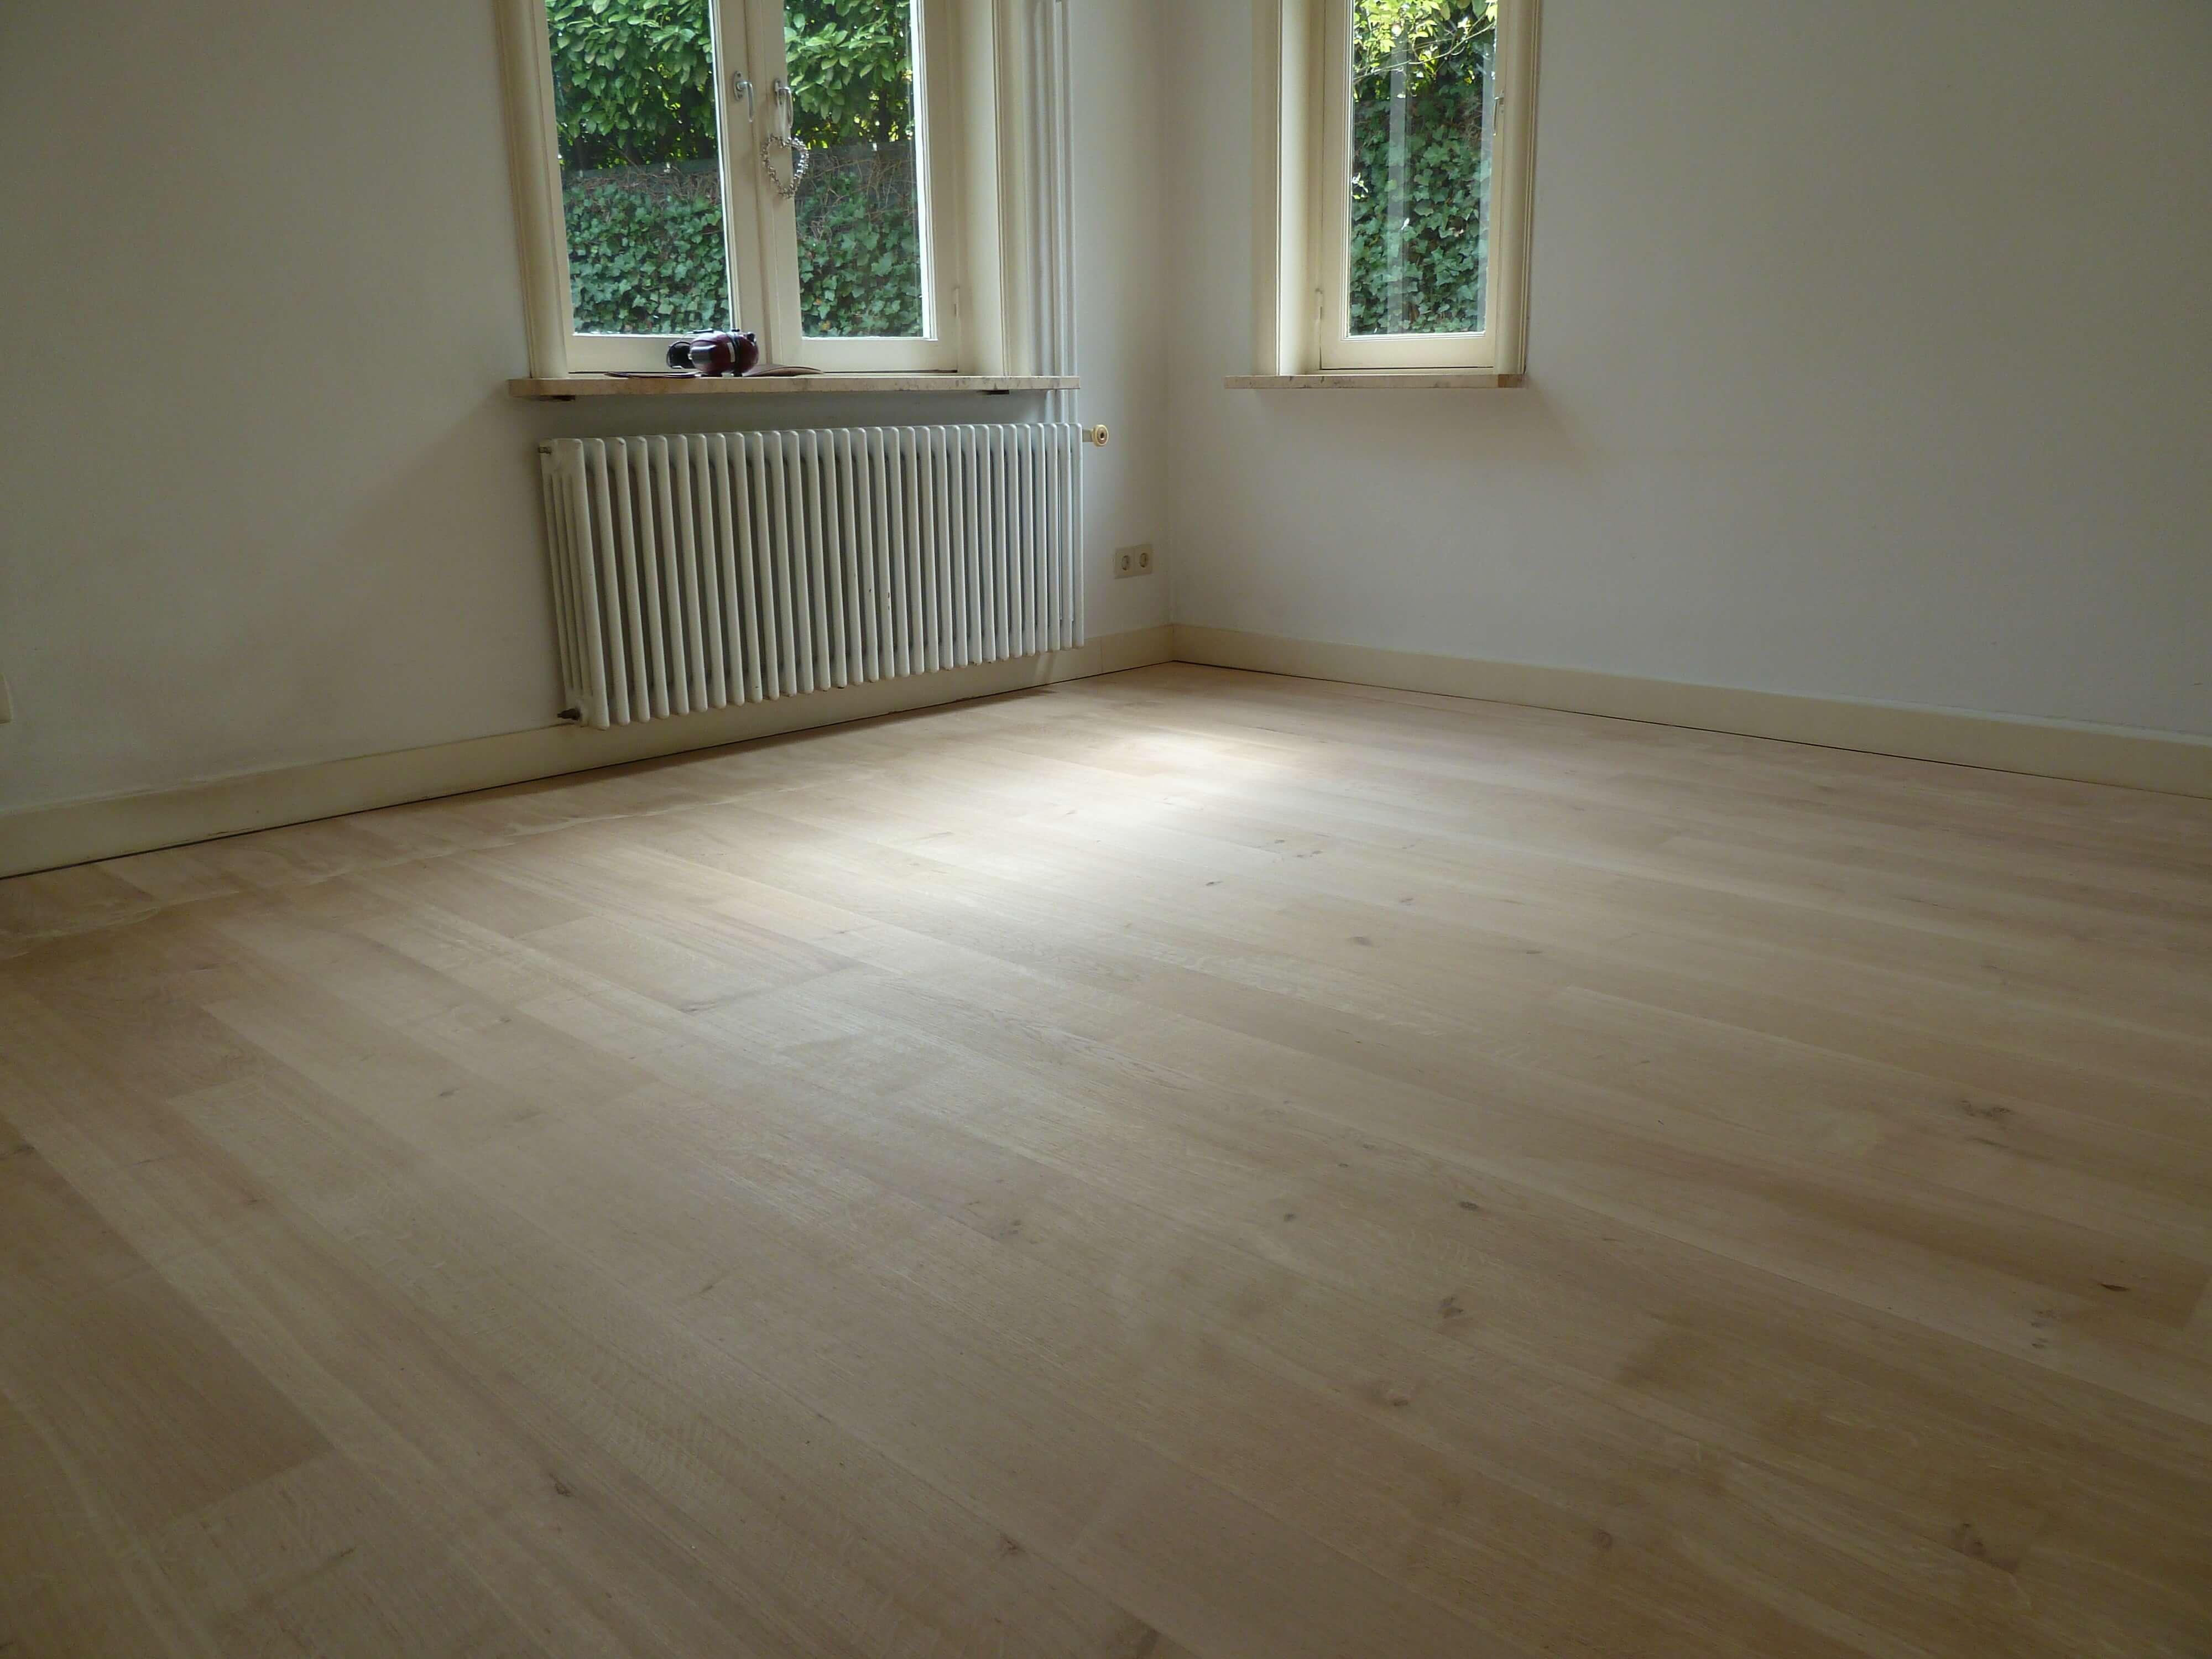 Laminaat lively oak eik beige laminaat vloeren